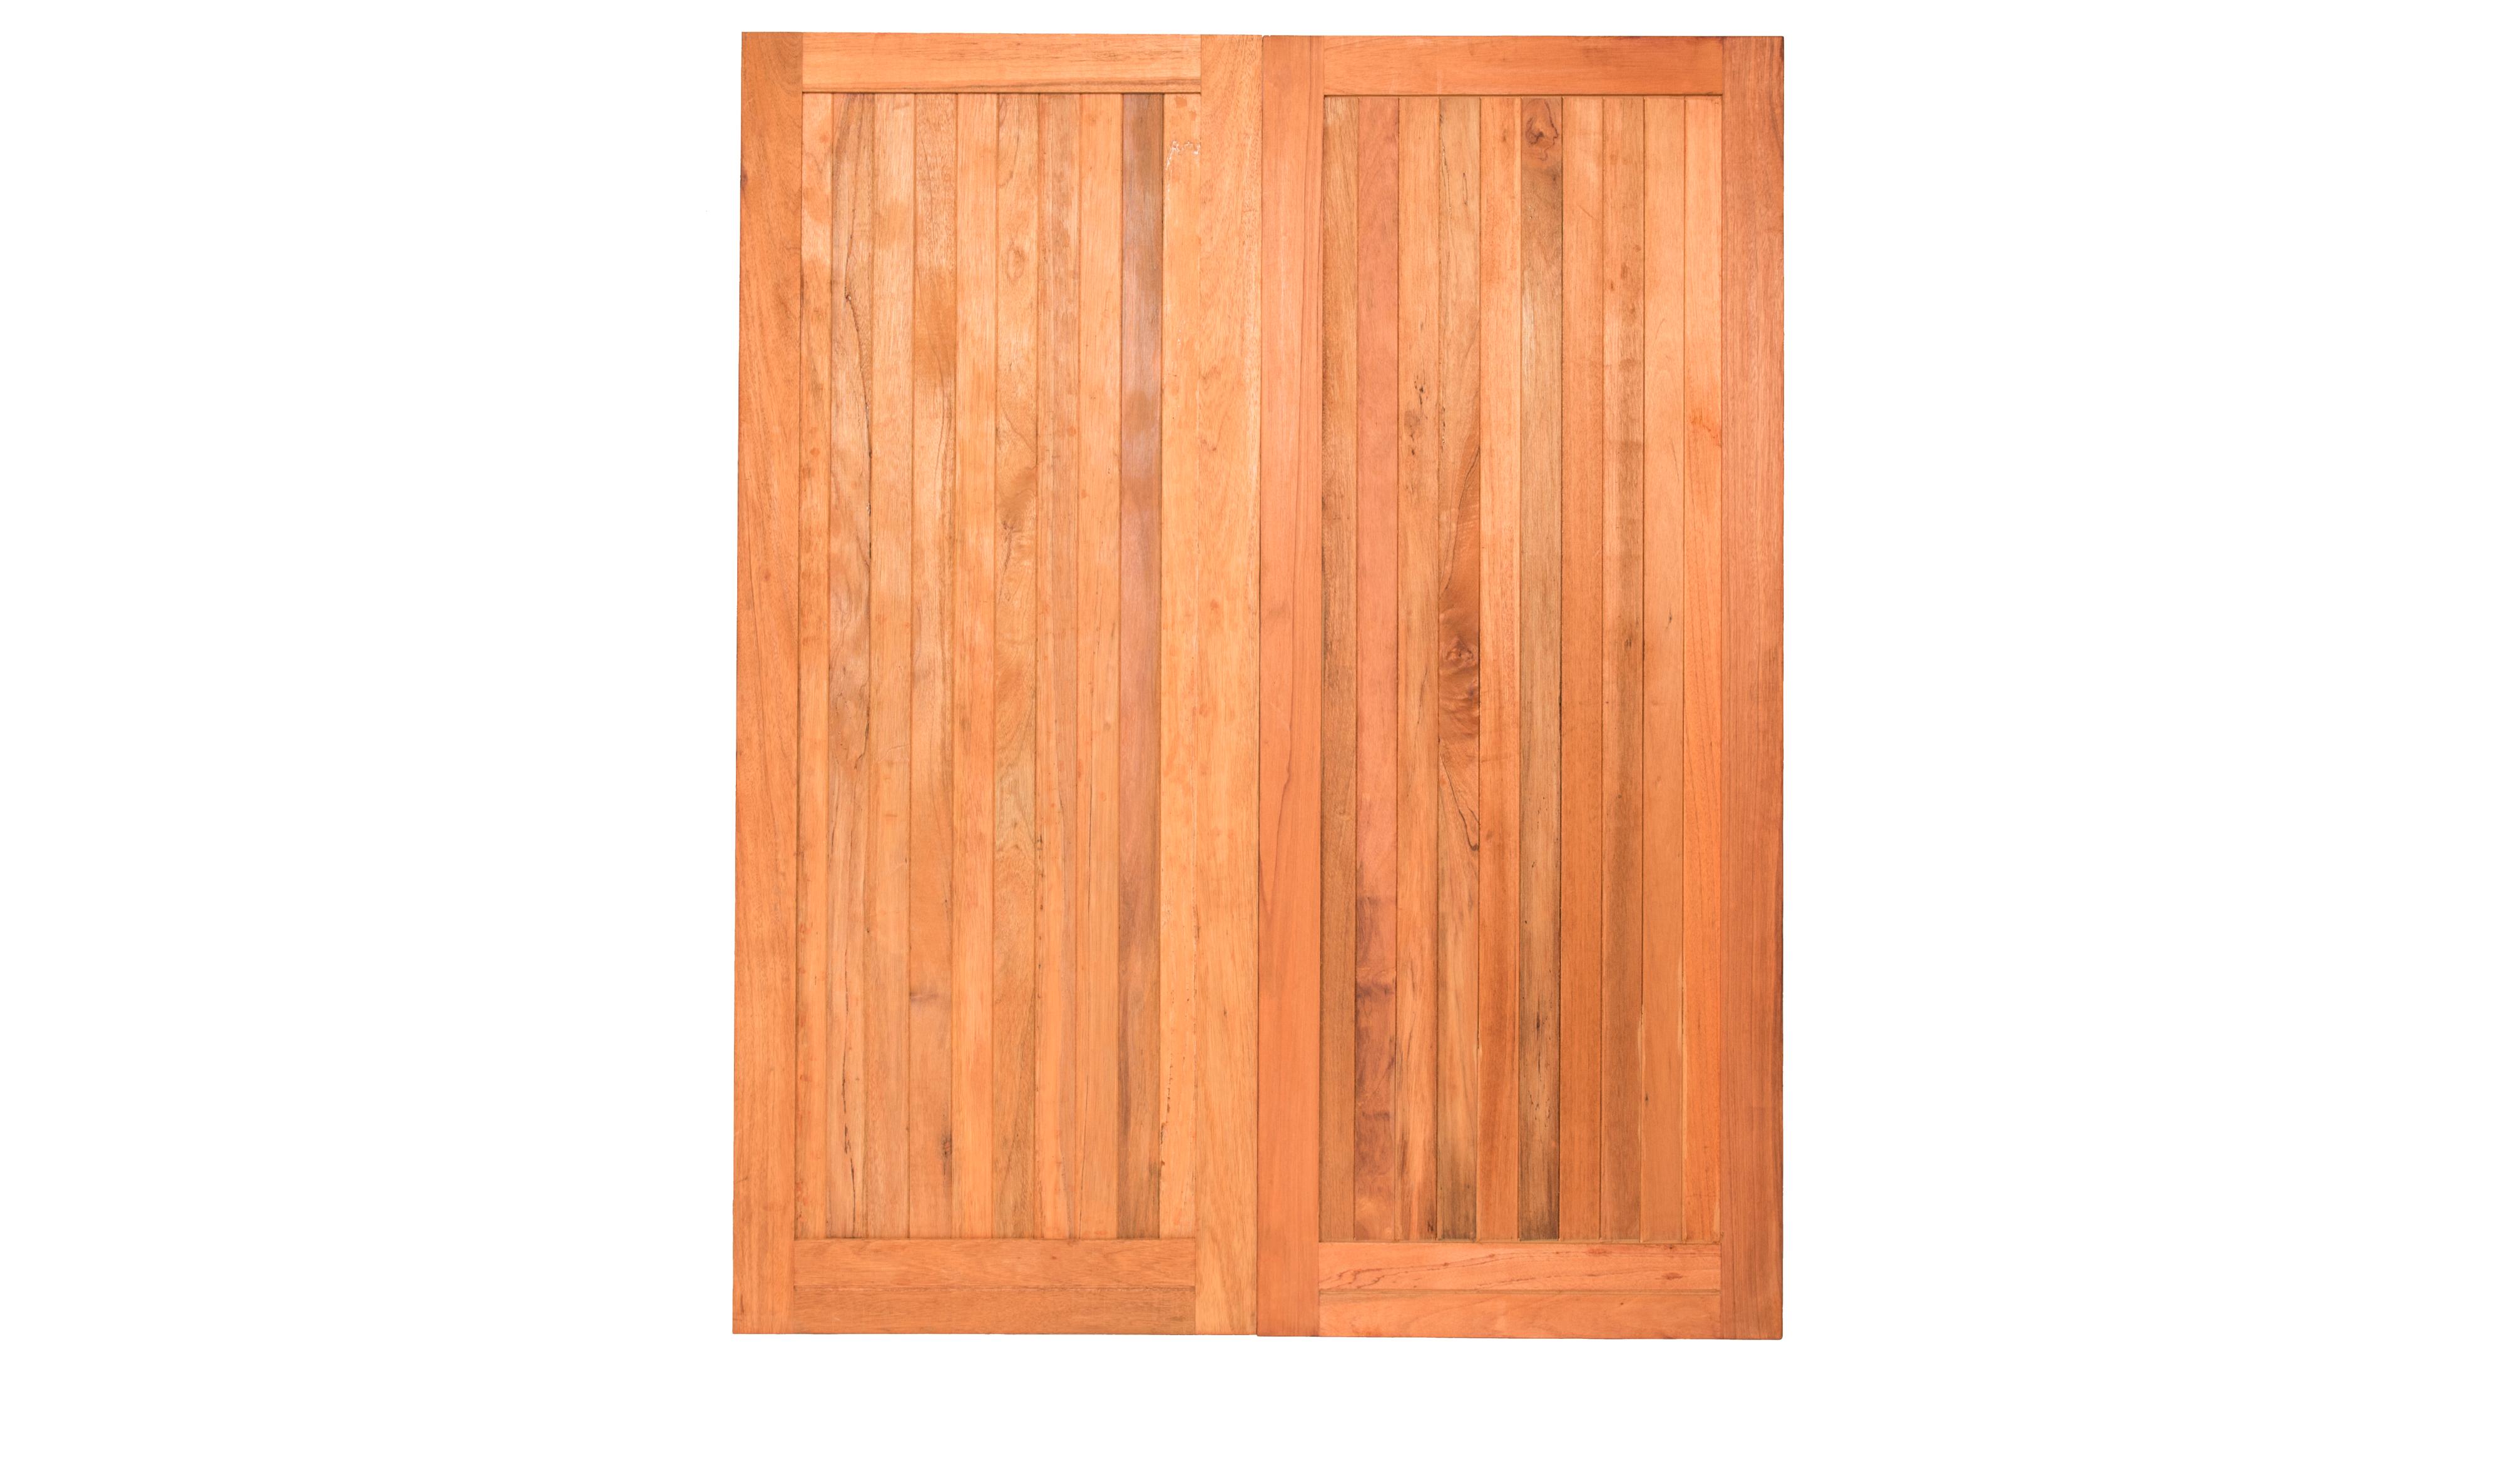 Flb ply back meranti double doors large exterior doors for Double doors for back door